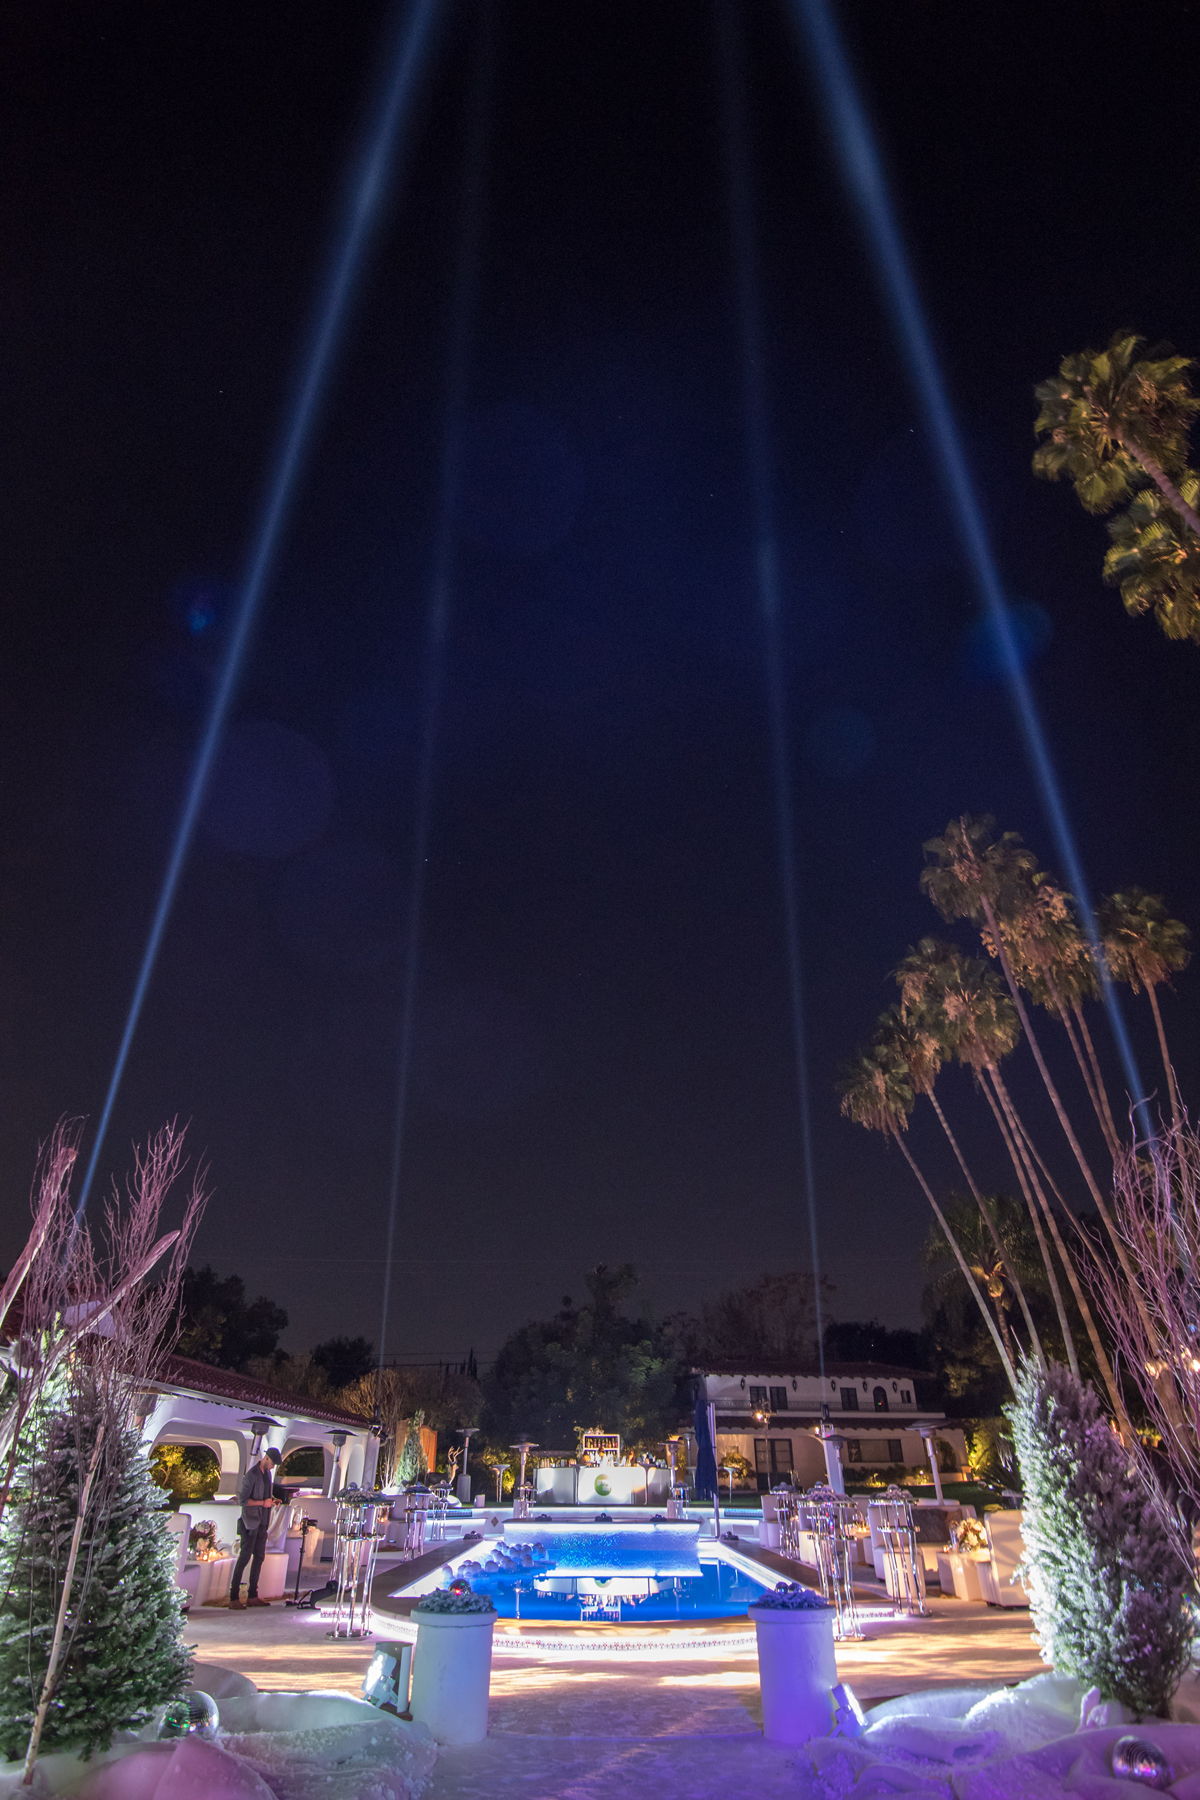 Narnia Inspired Opulent Winter Wonderland Party laser lights in the sky.jpg